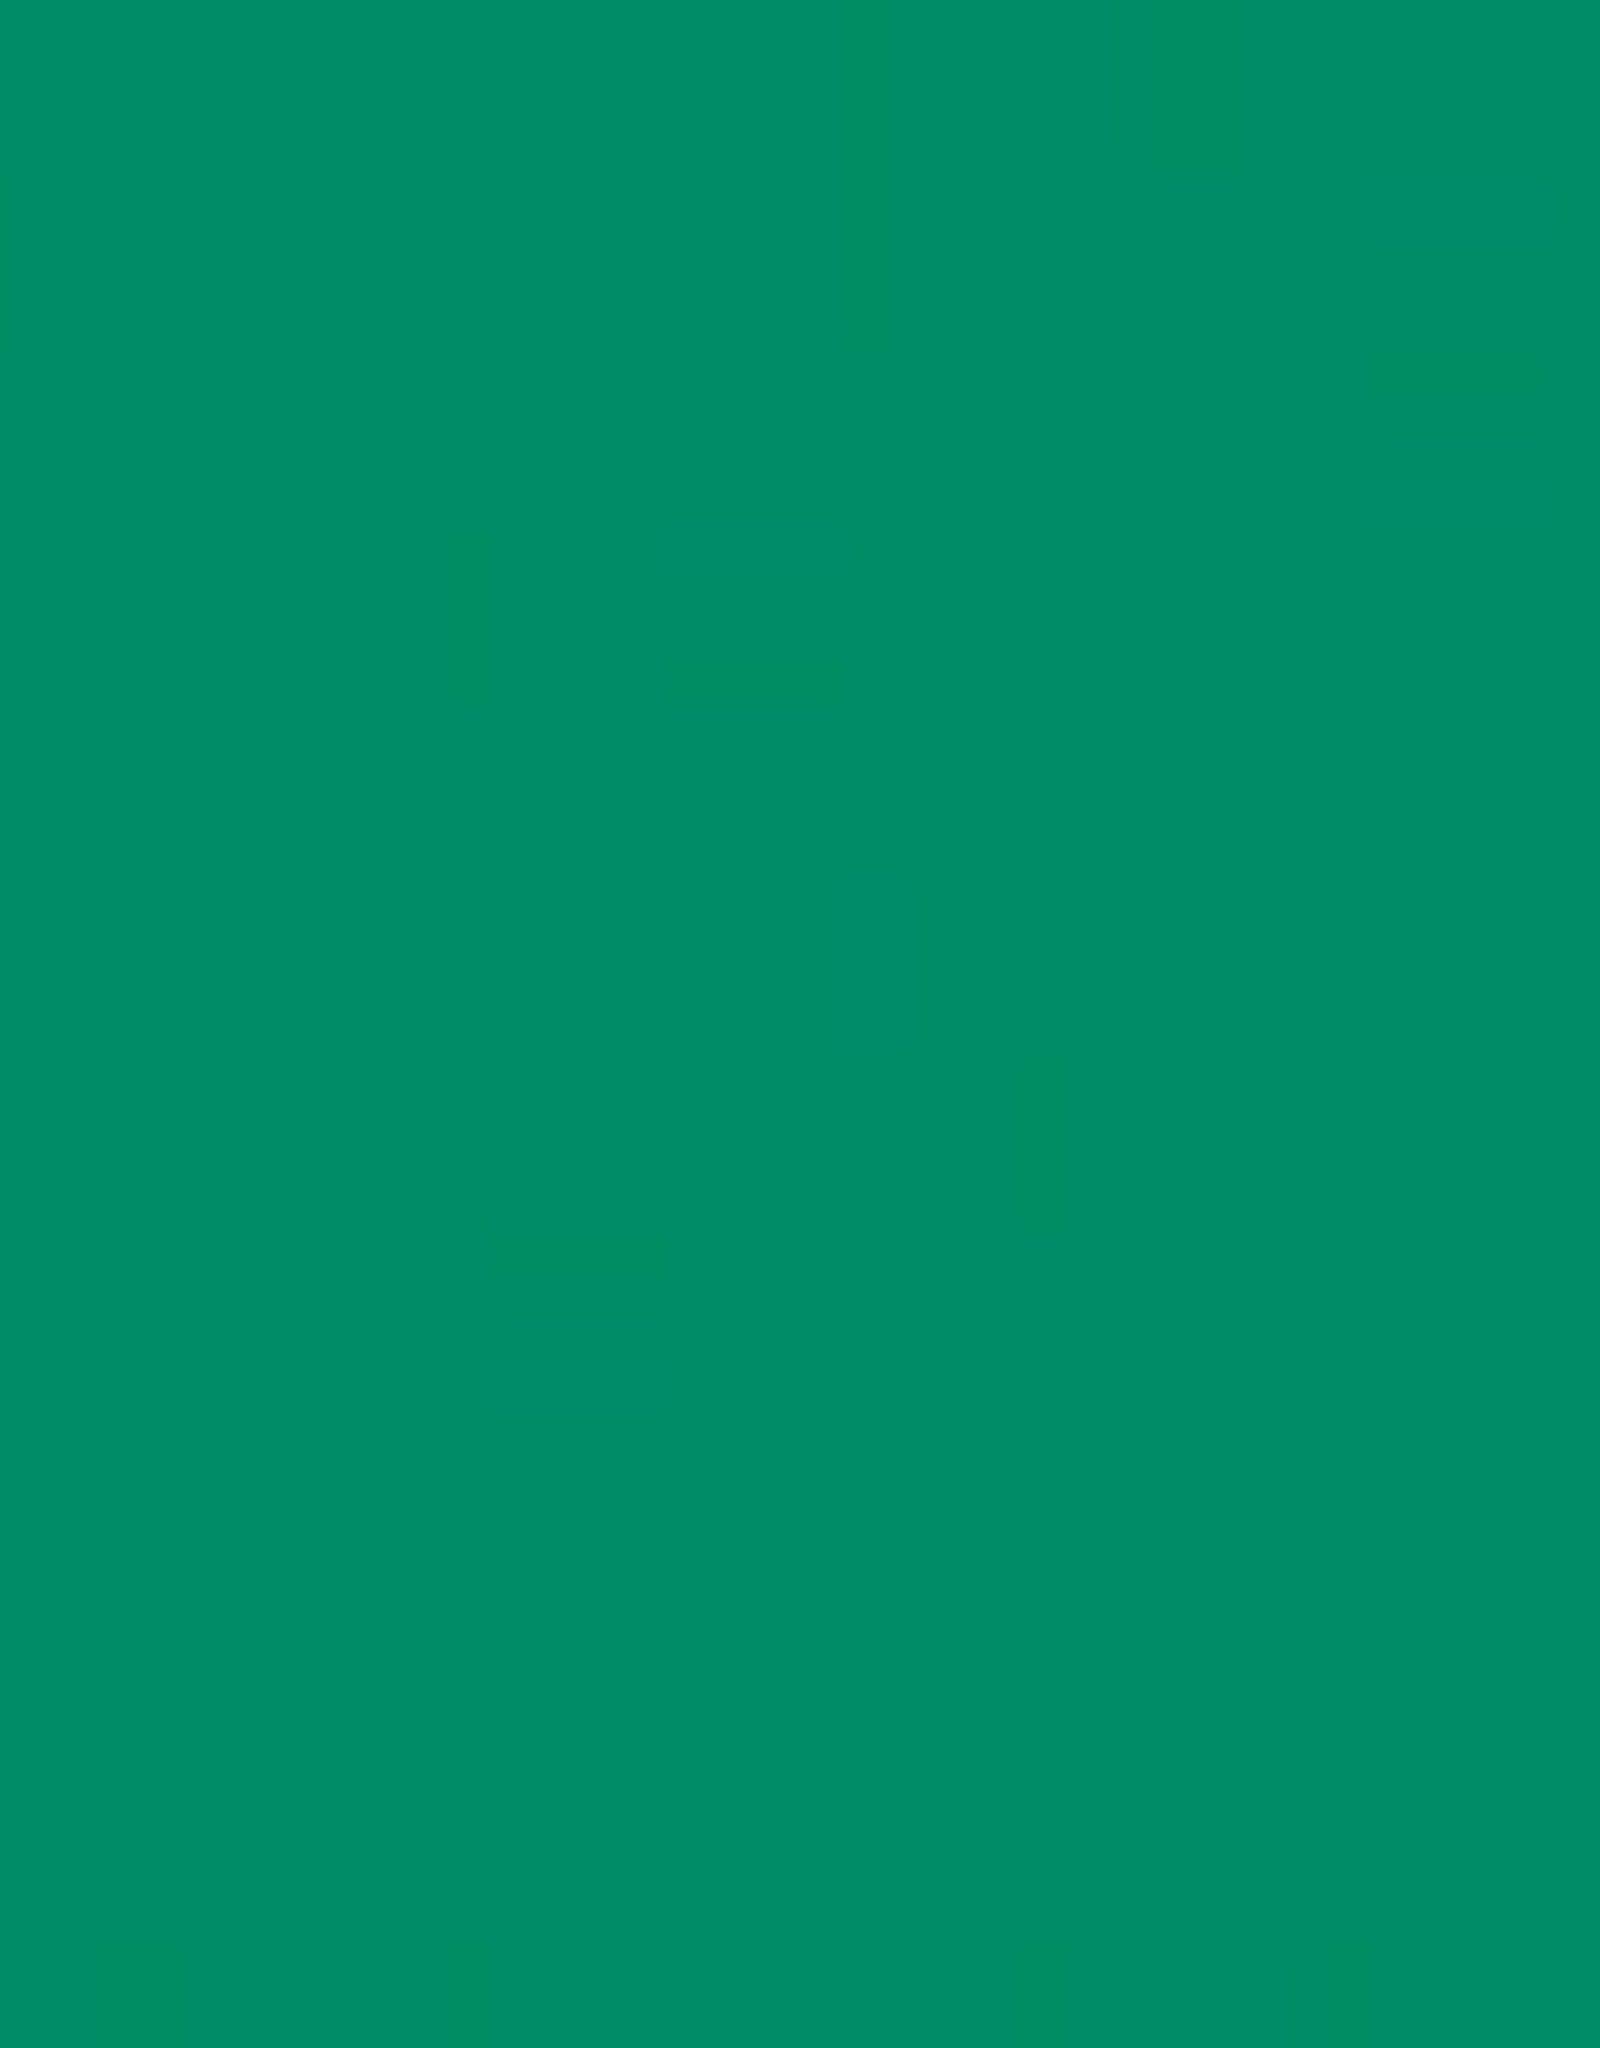 Jacquard Dye-na-Flow Emerald Green